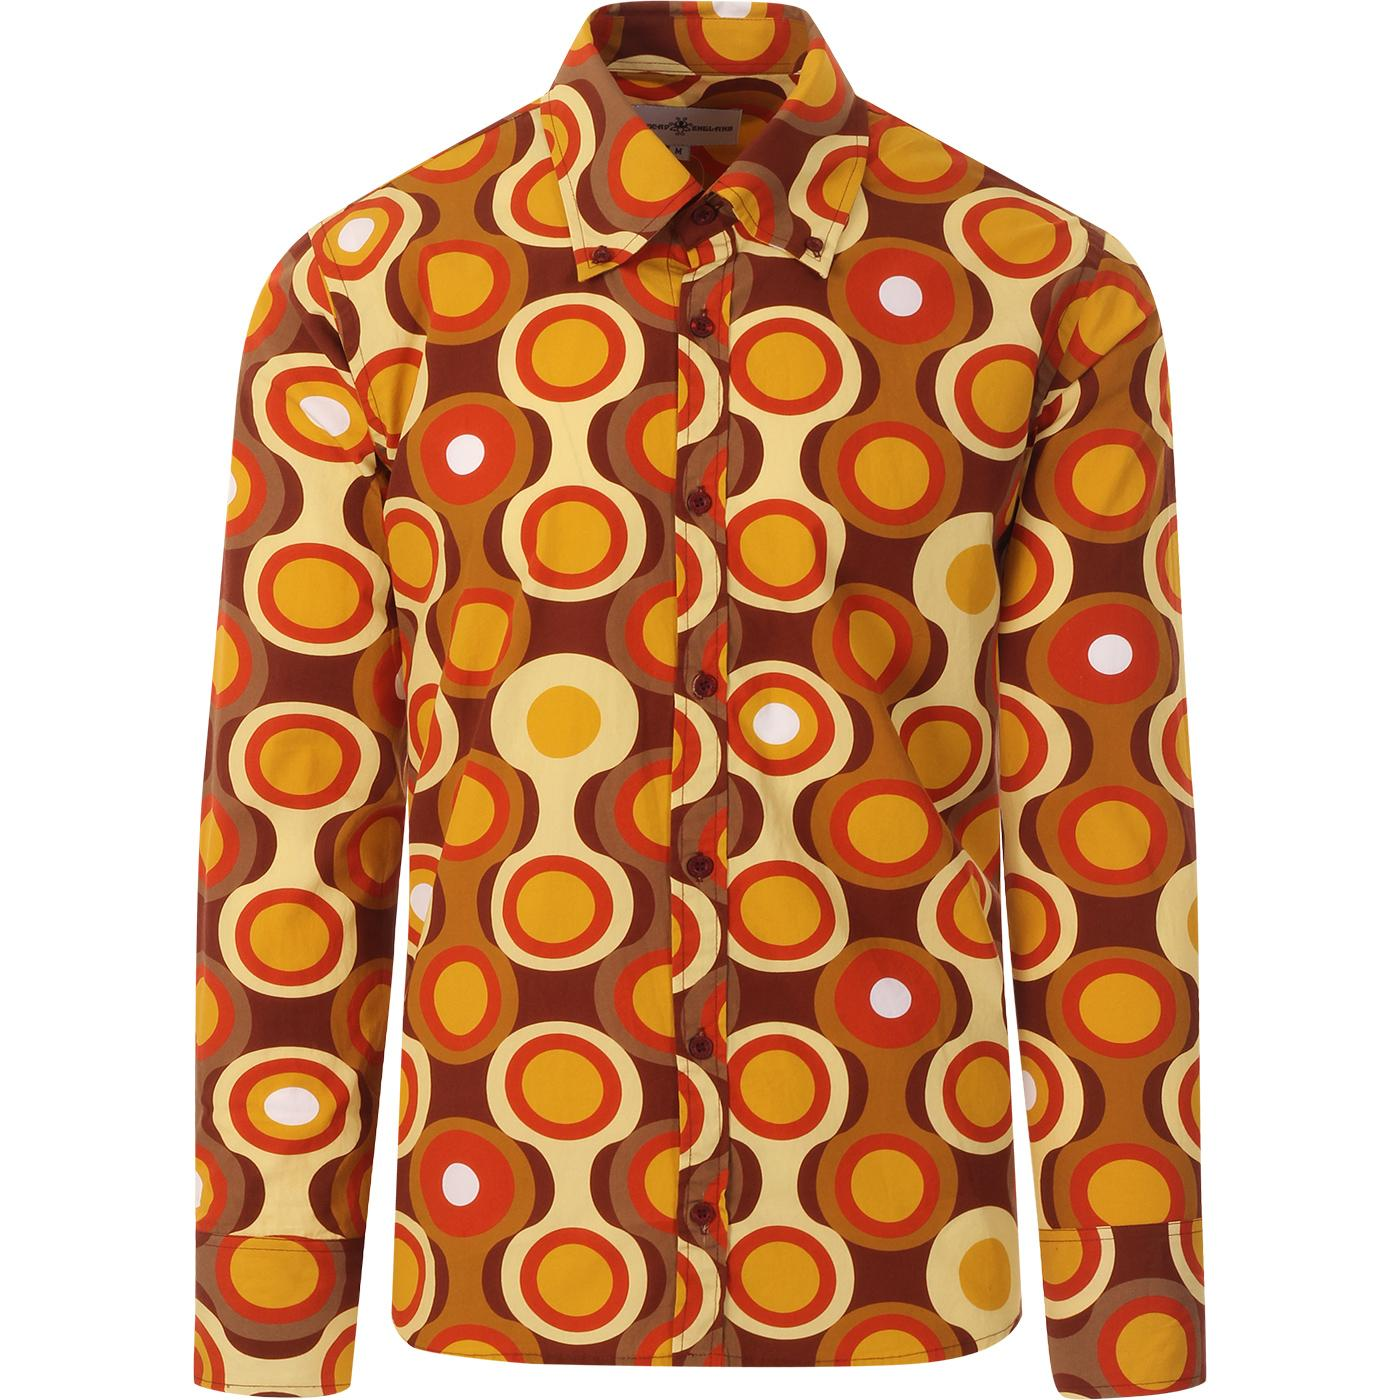 madcap england mens new trip circle bold print long sleeve shirt brown mustard